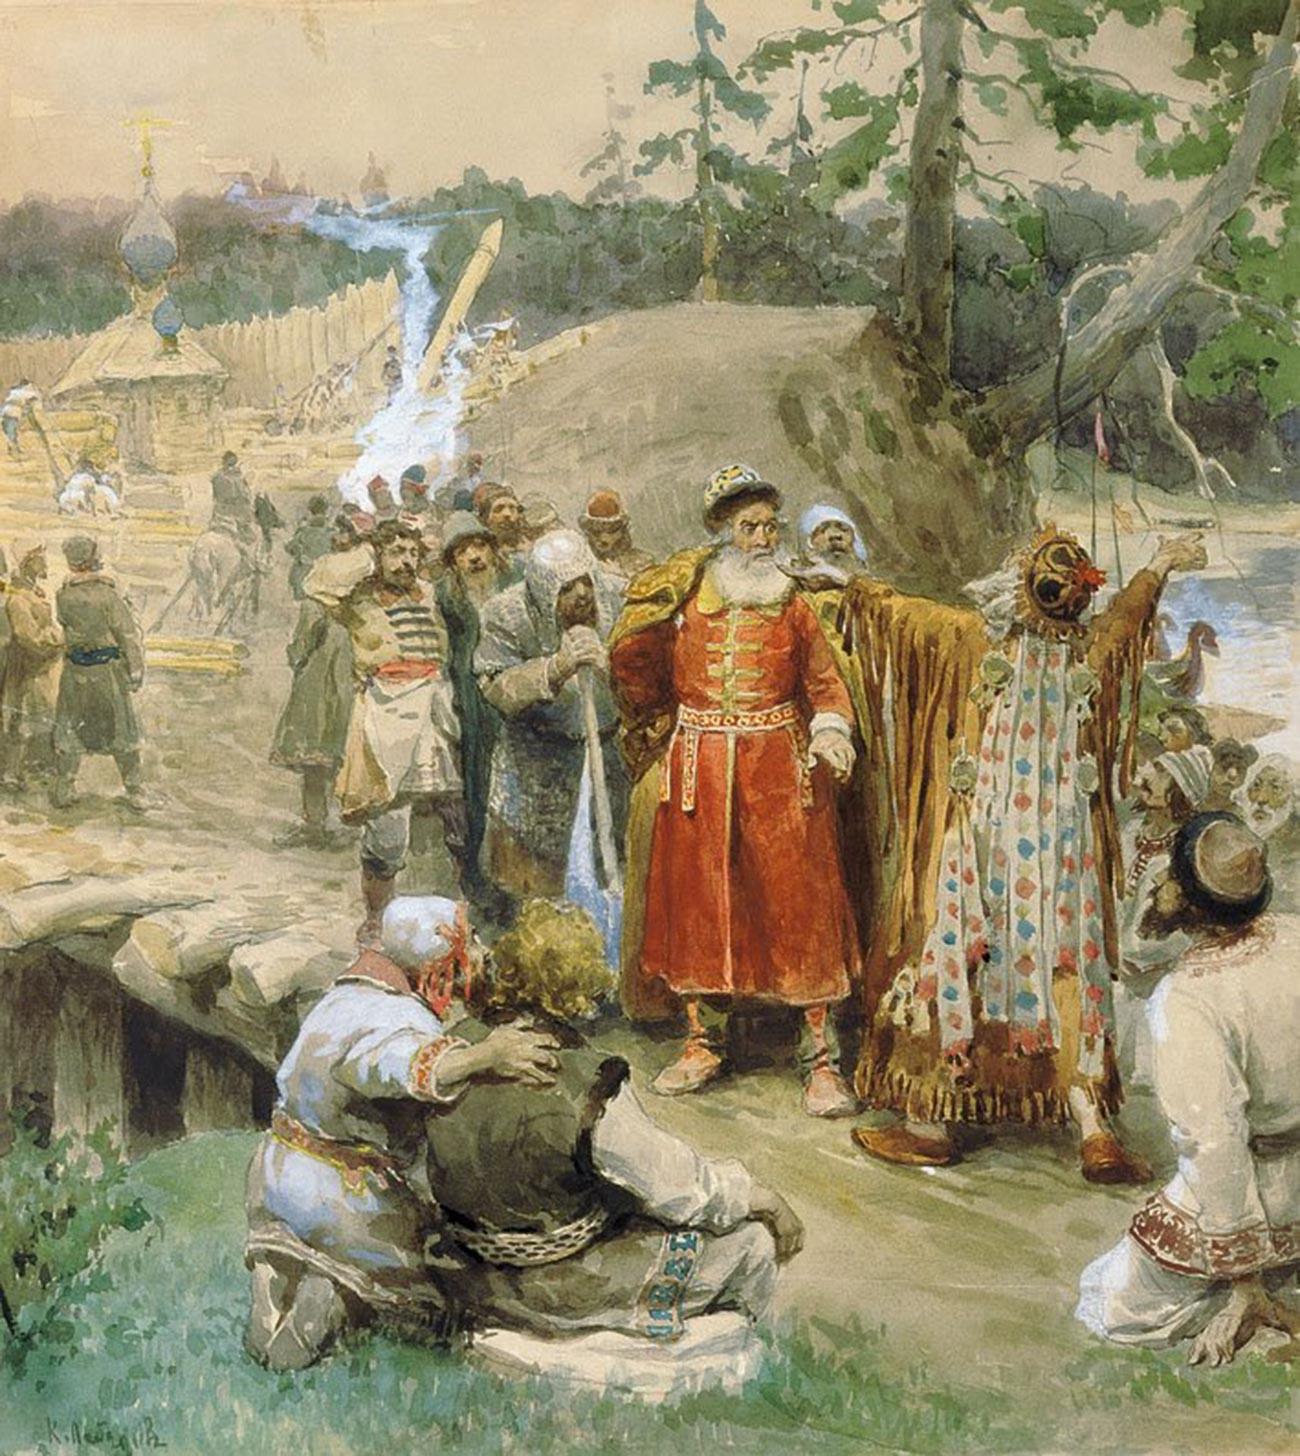 Rusi osvajajo nova ozemlja